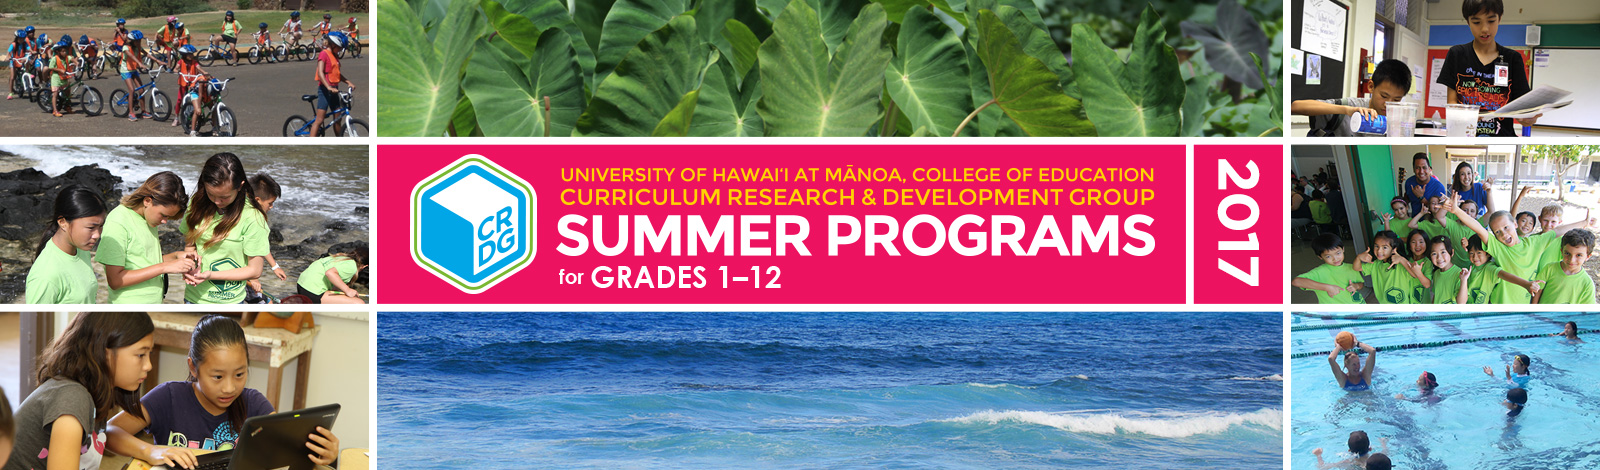 summer programs 2017 graphic